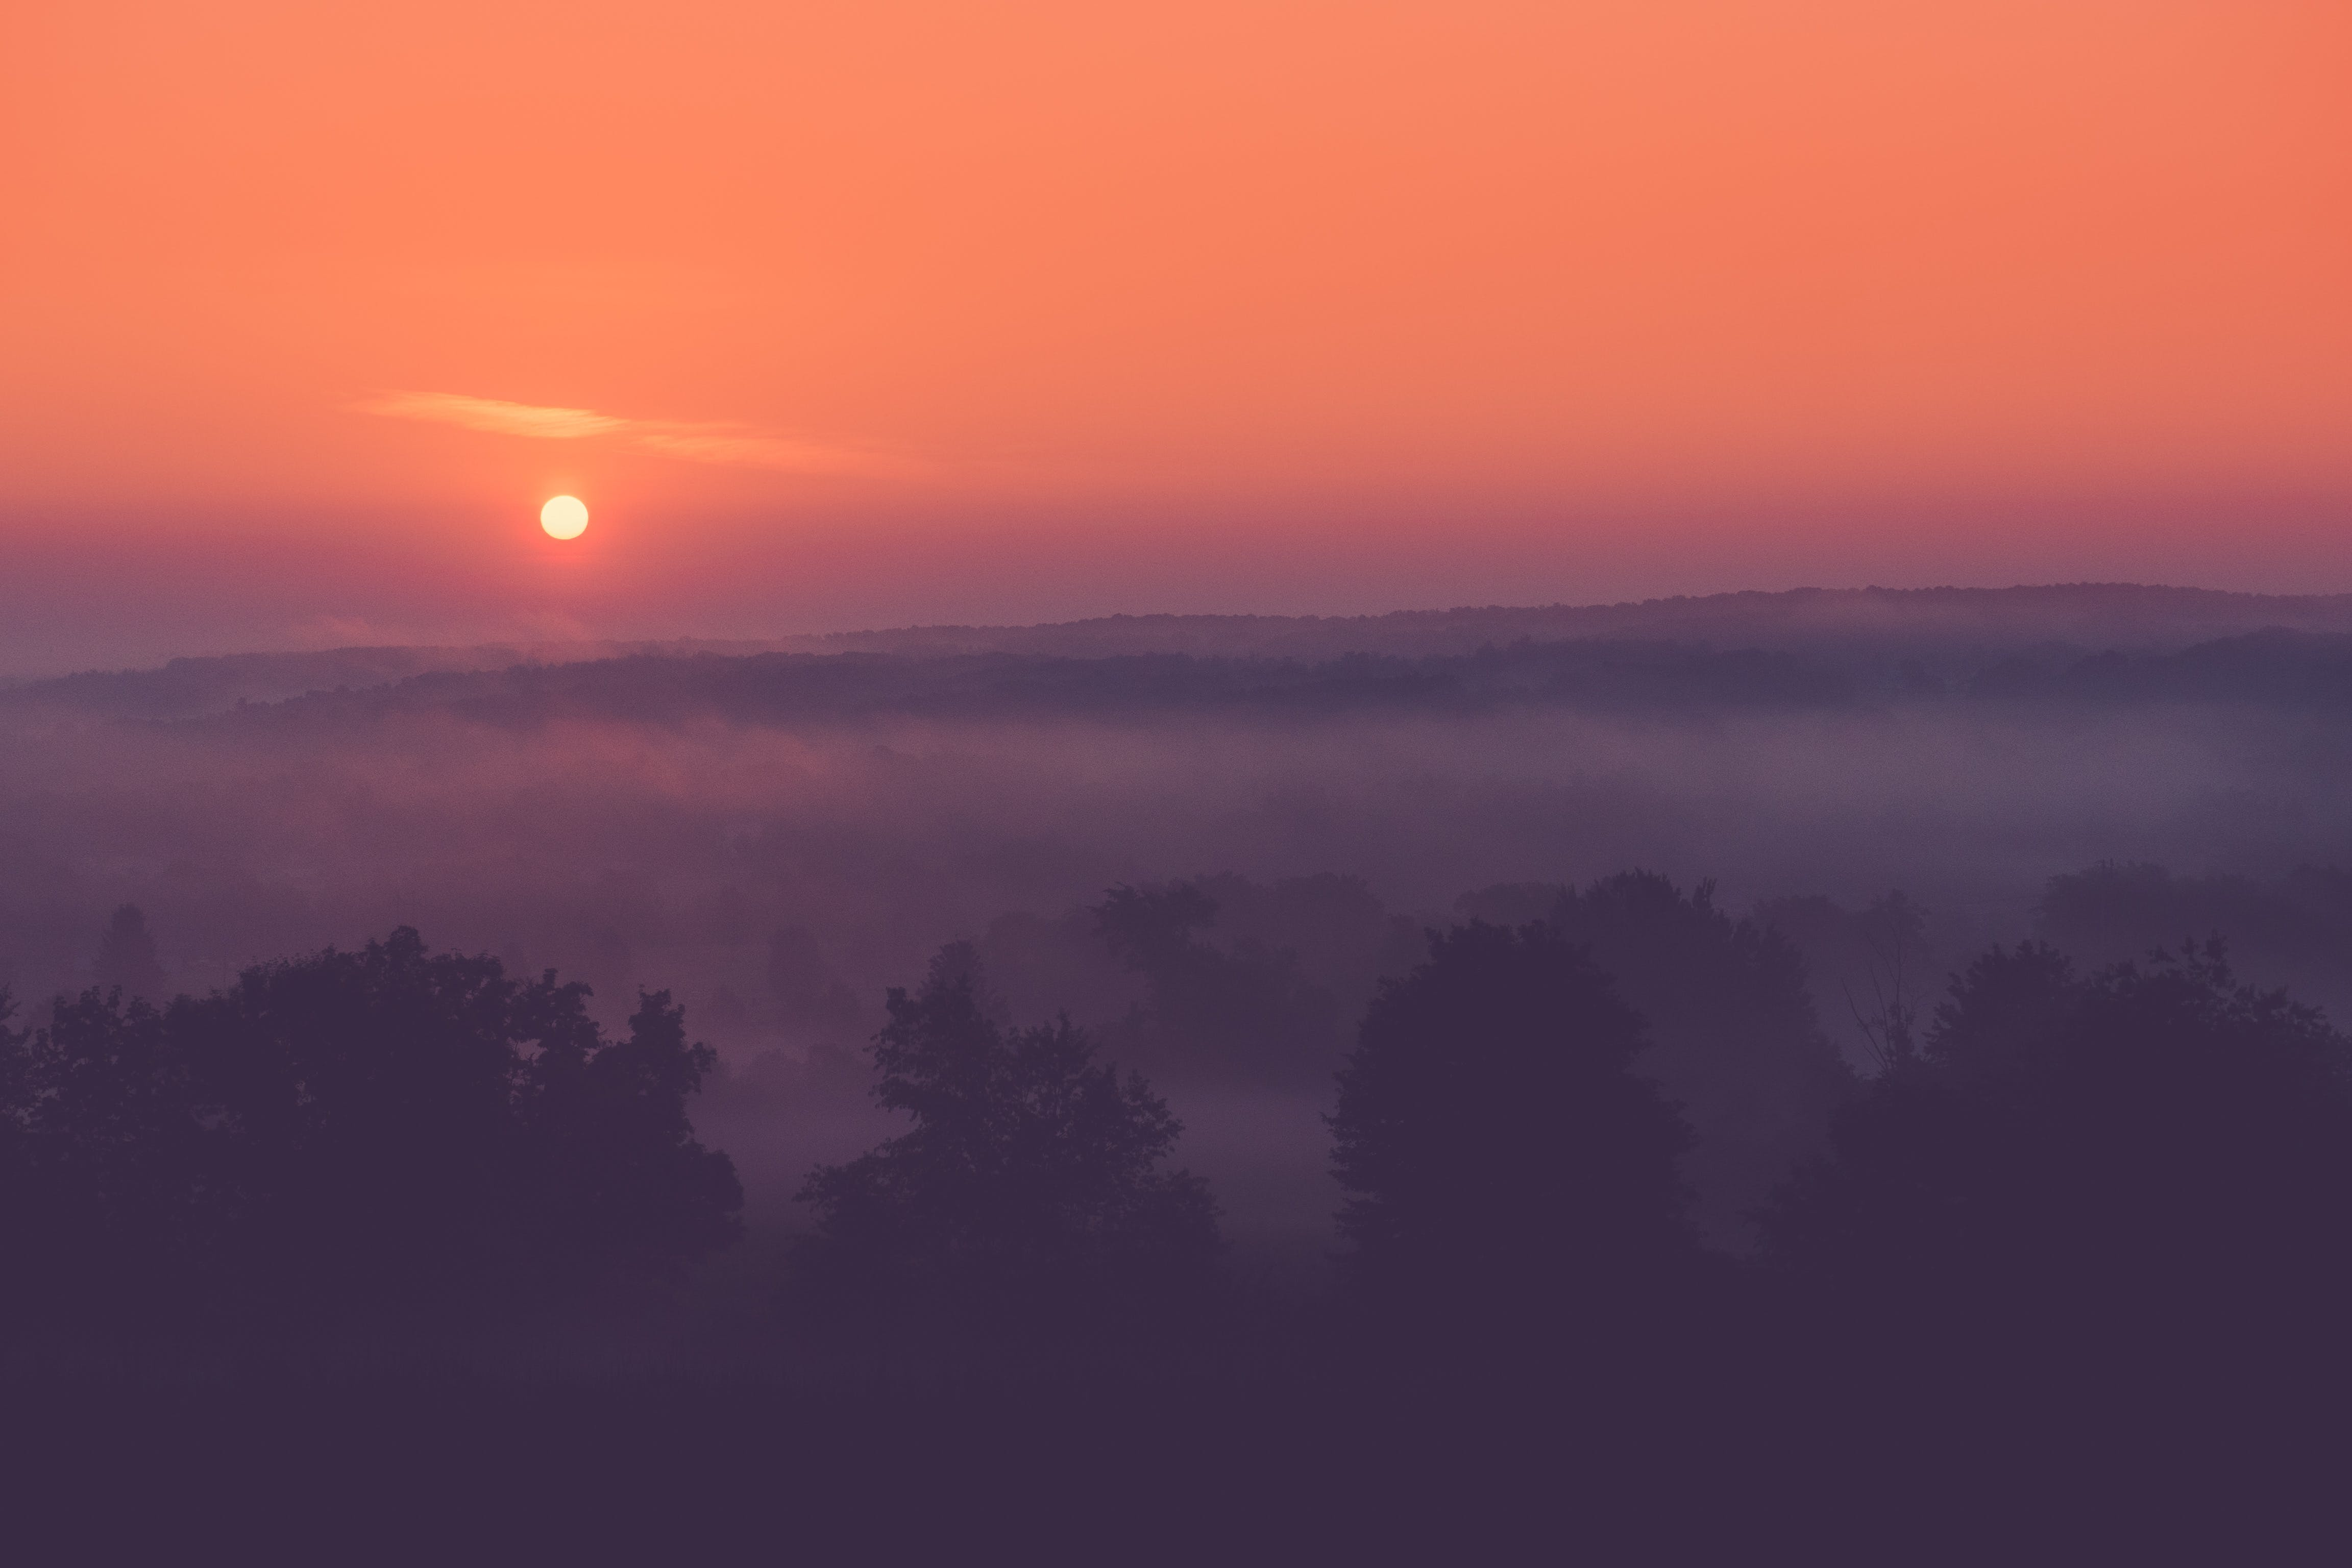 Free stock photo of landscape, sun, sunrise, morning